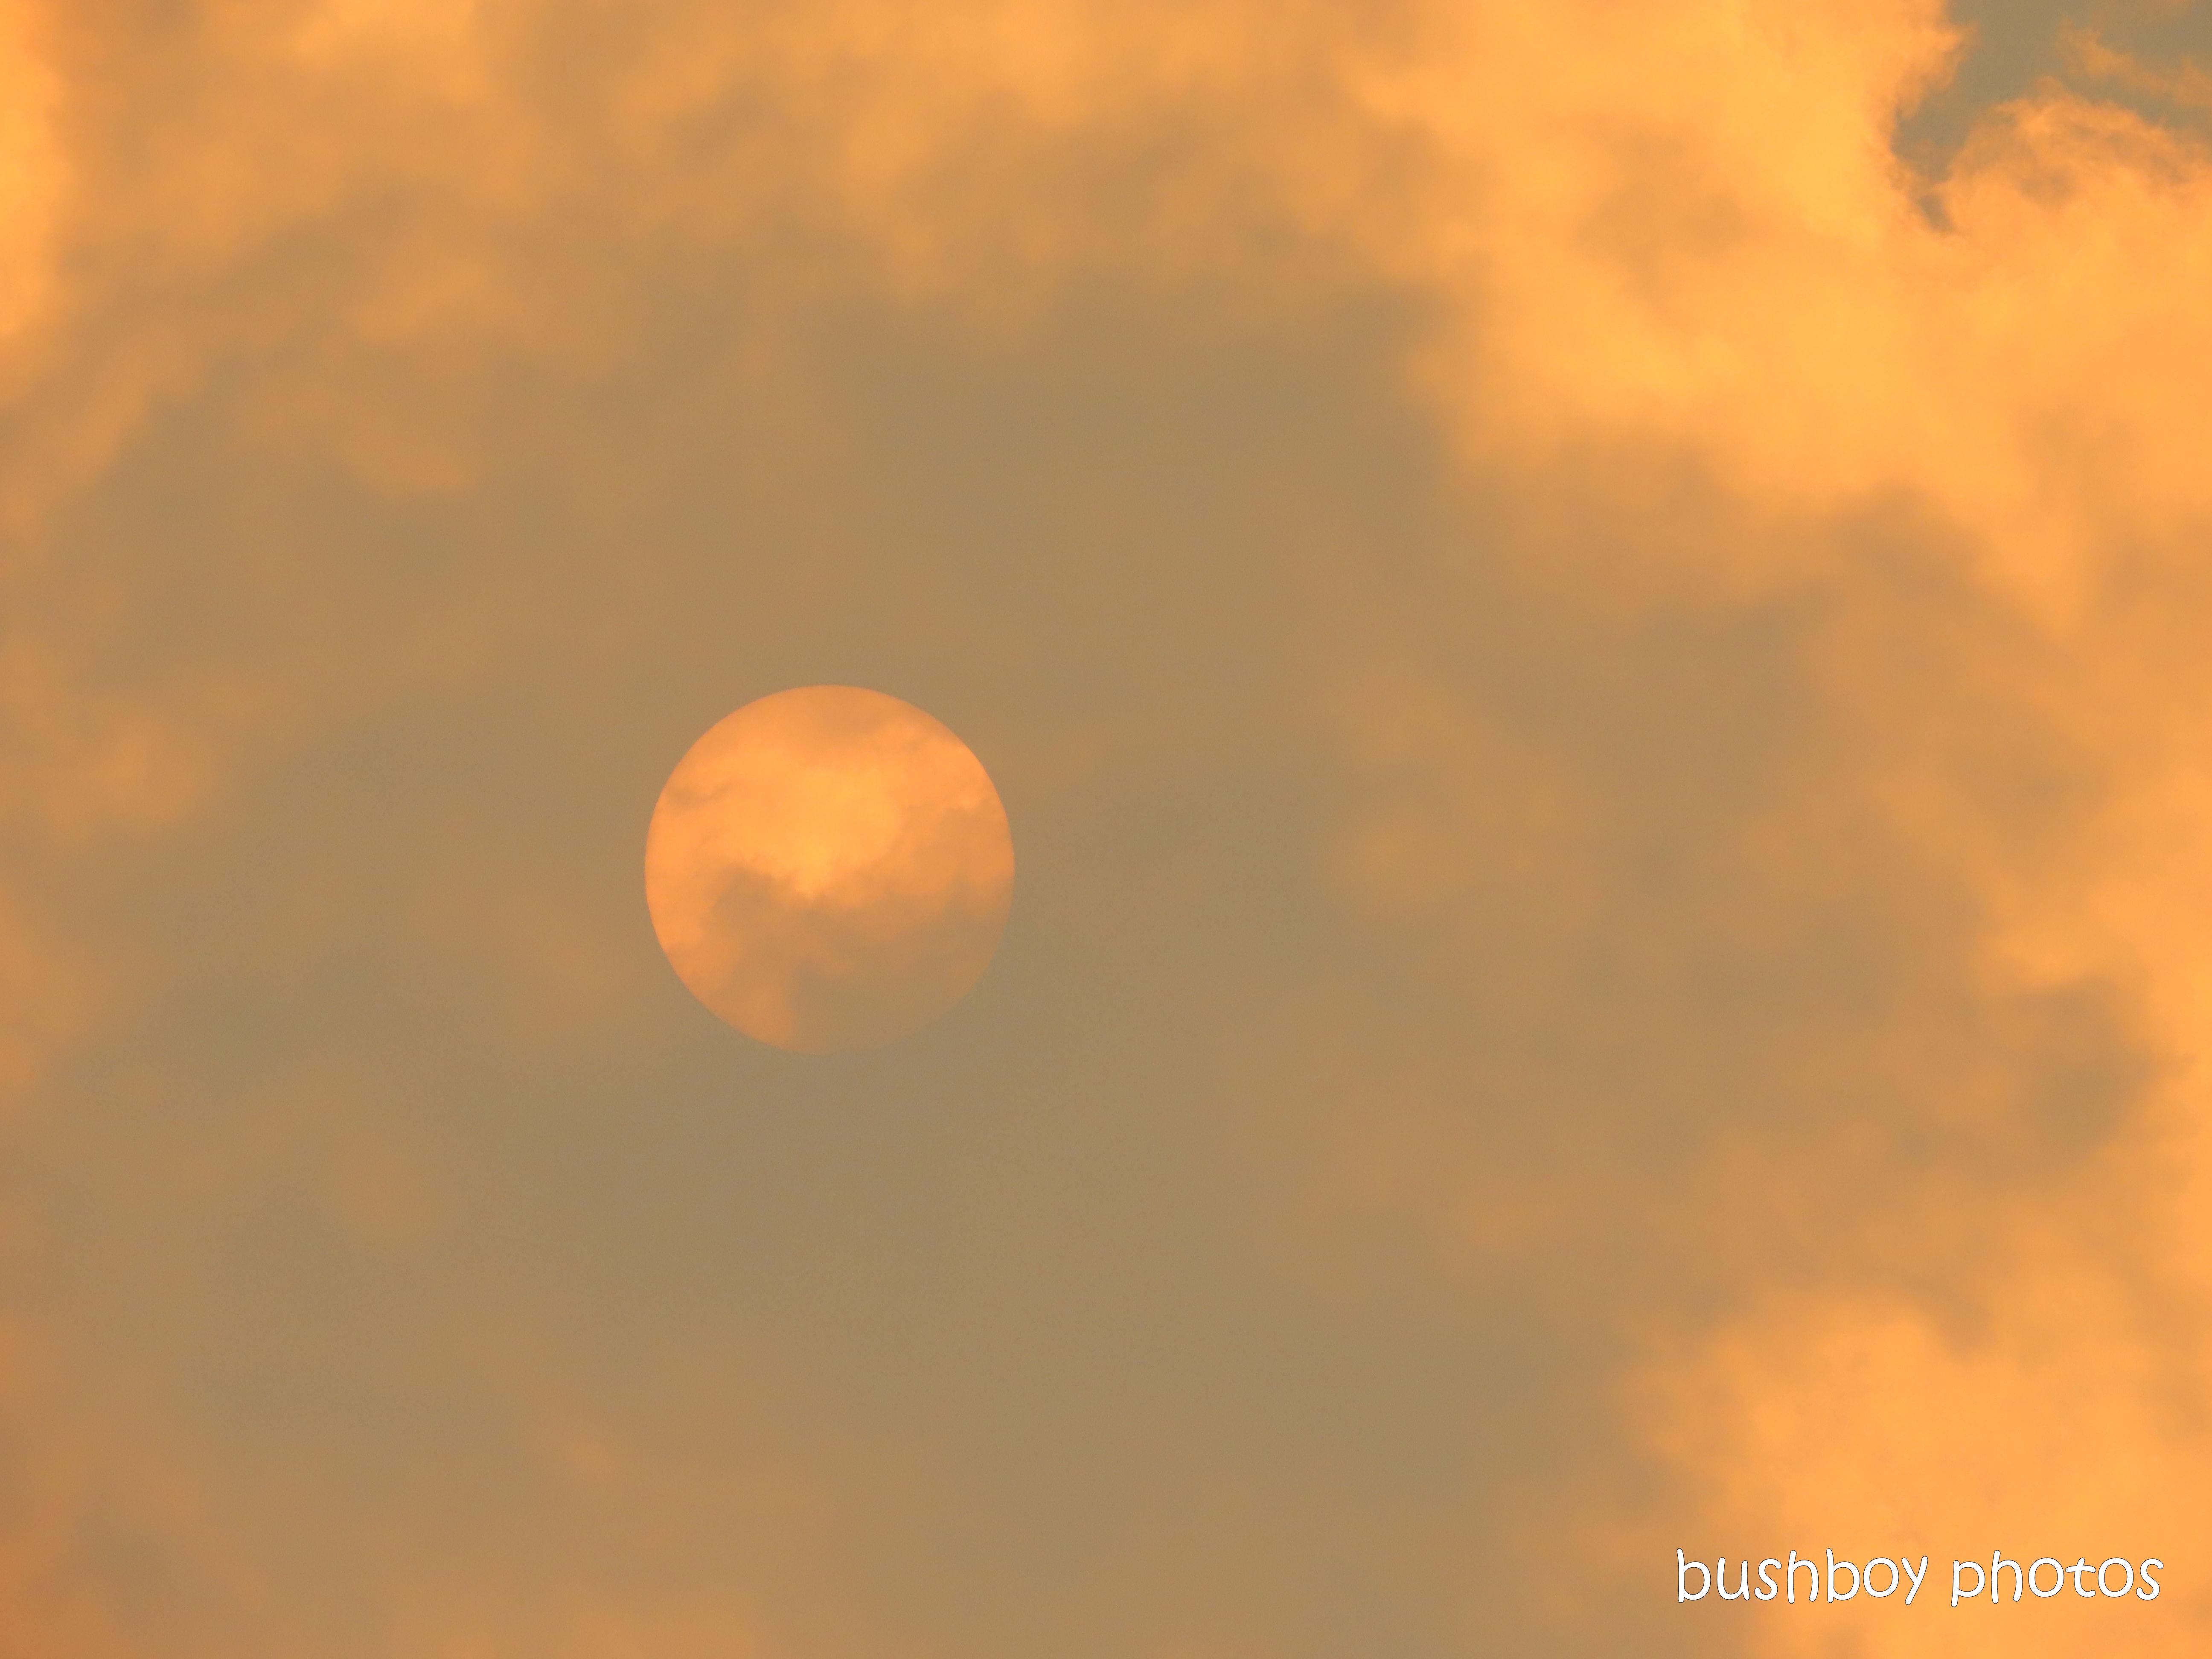 sun2_clouds_smoke_fire_named_home_jackadgery_oct 2019